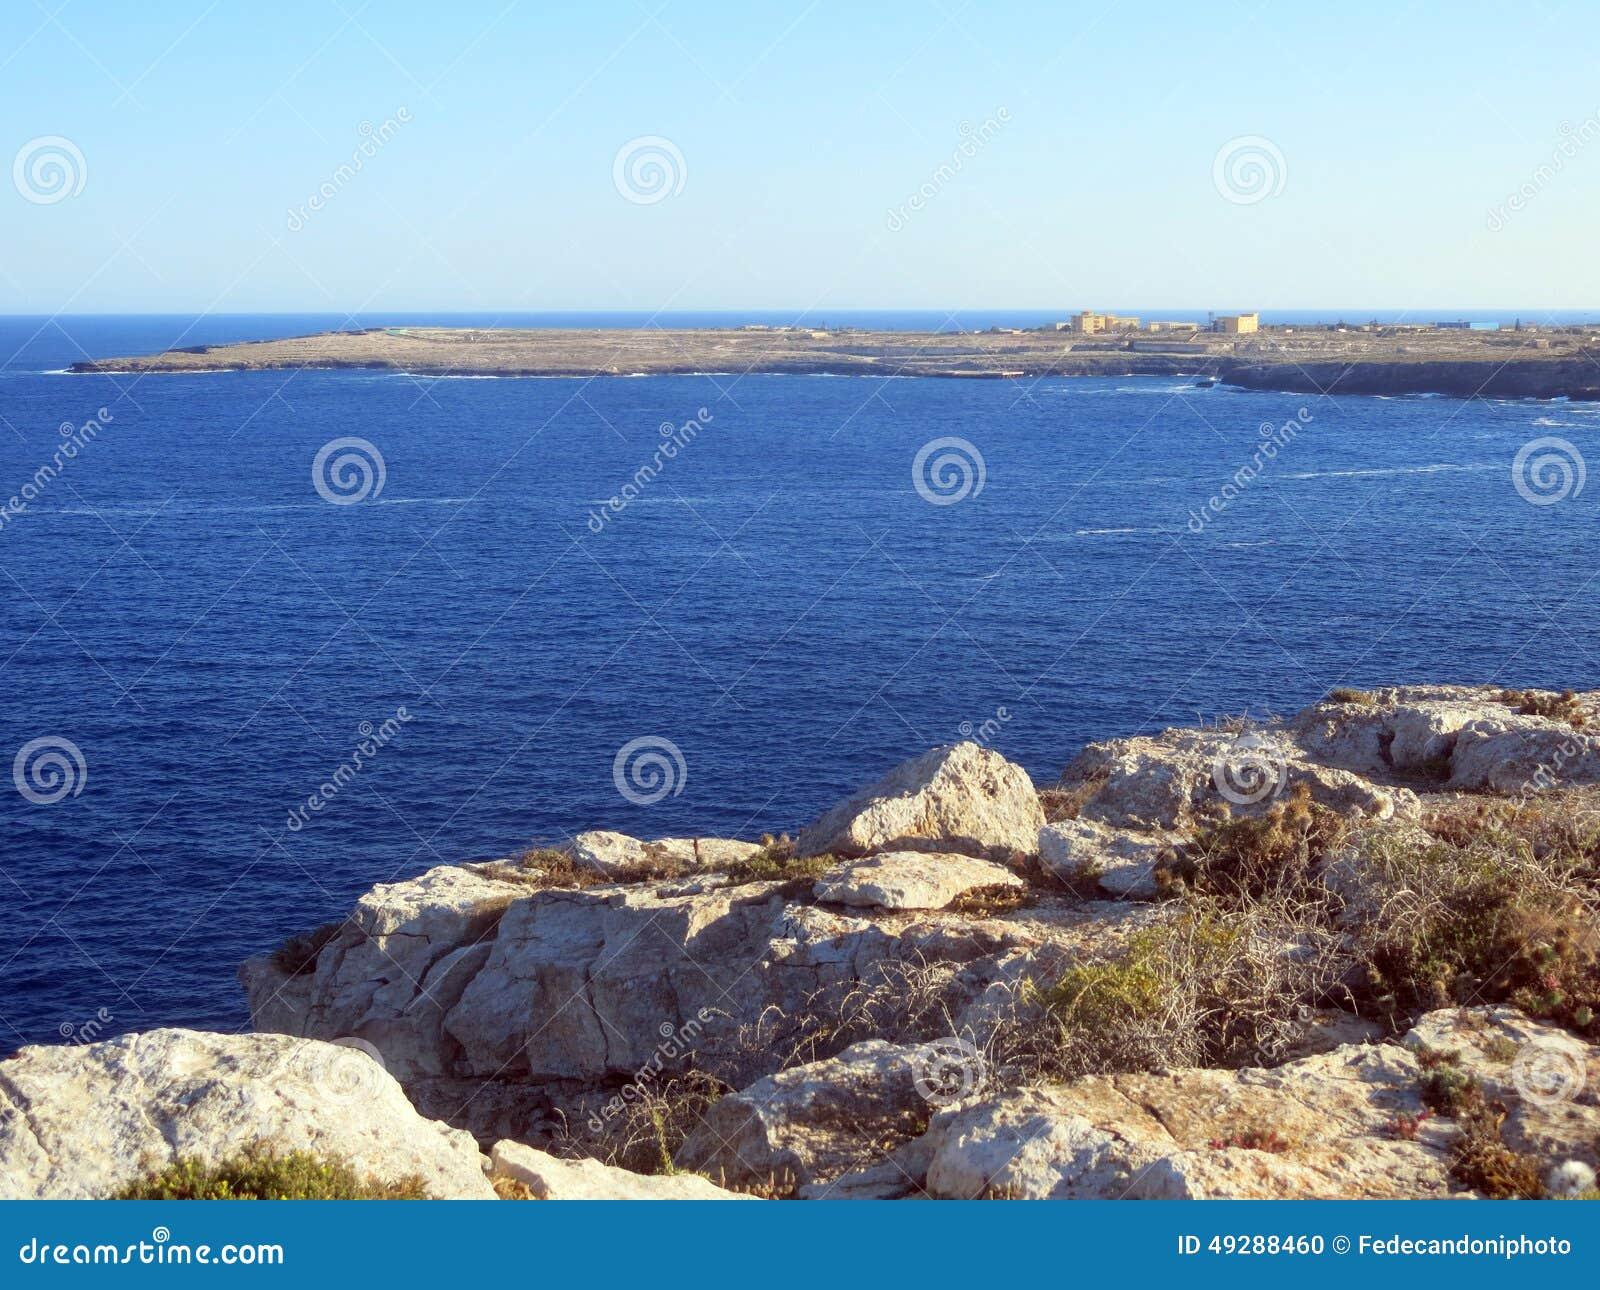 Sea of the LAMPEDUSA island in Italy